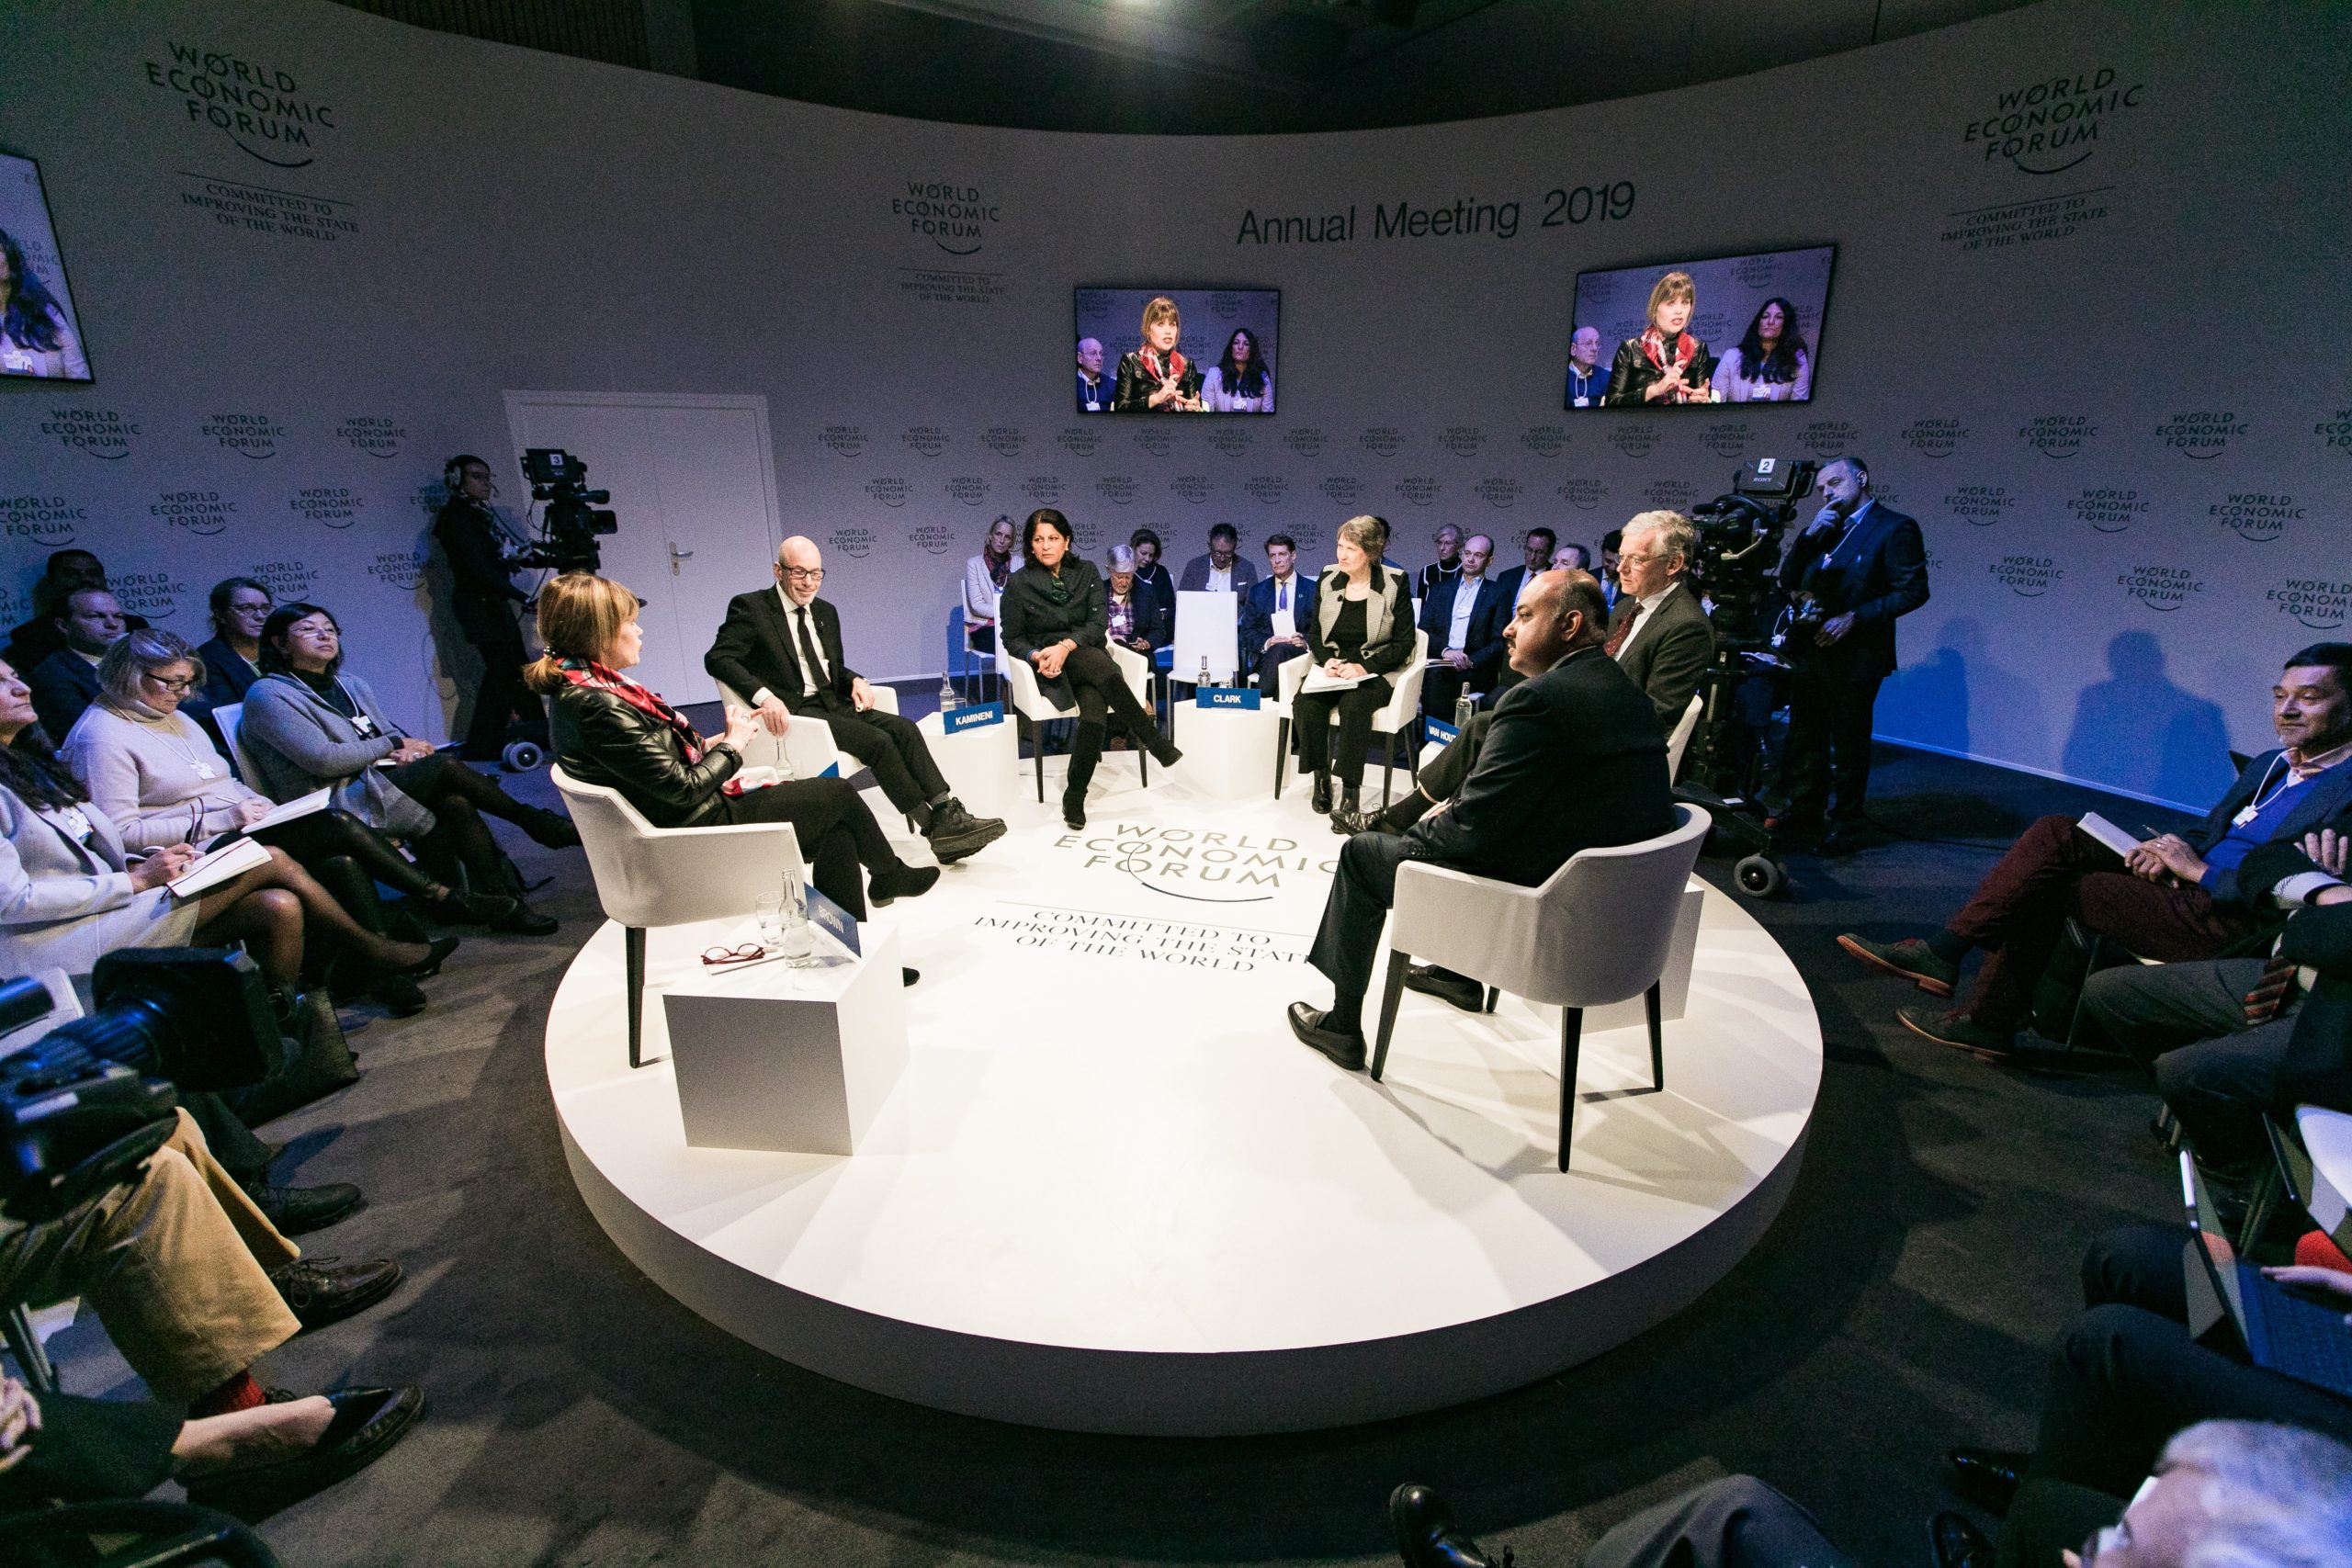 The Davos Manifesto 2020